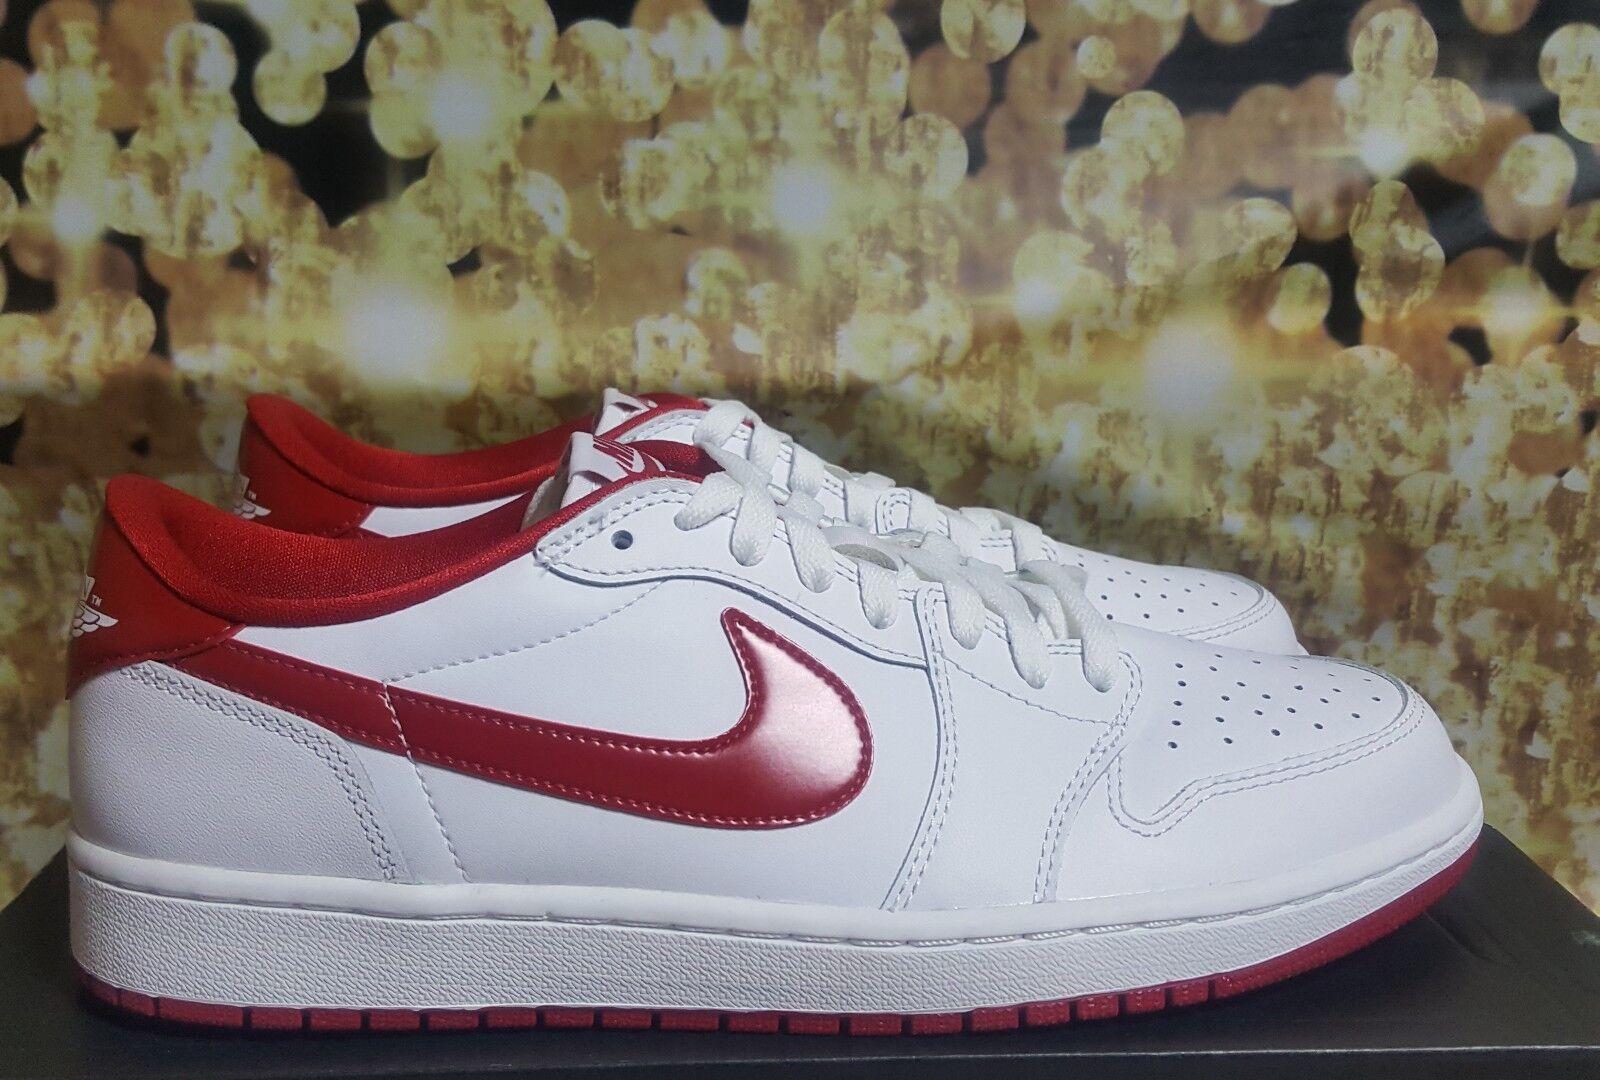 Air jordan 1 Retro Low OG White/Varsity Red/white size 10.5 Seasonal clearance sale